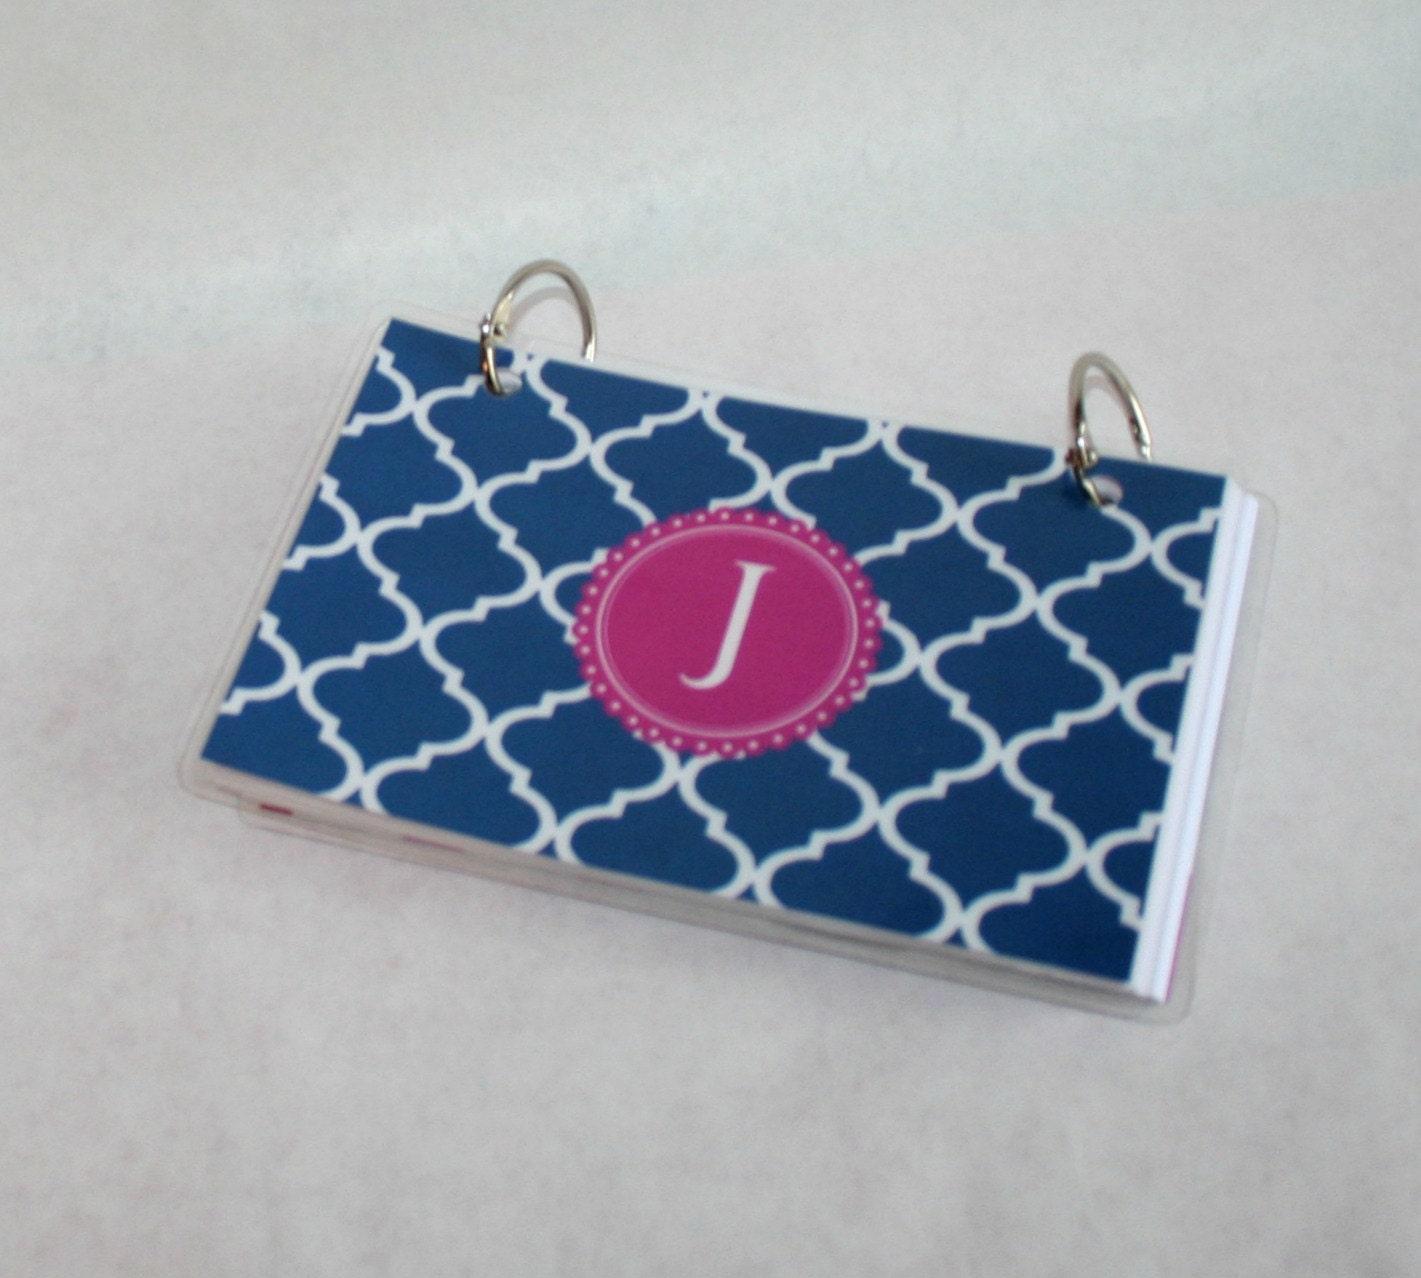 Index Card Binder 3 X 5 Index Card Holder Personalized